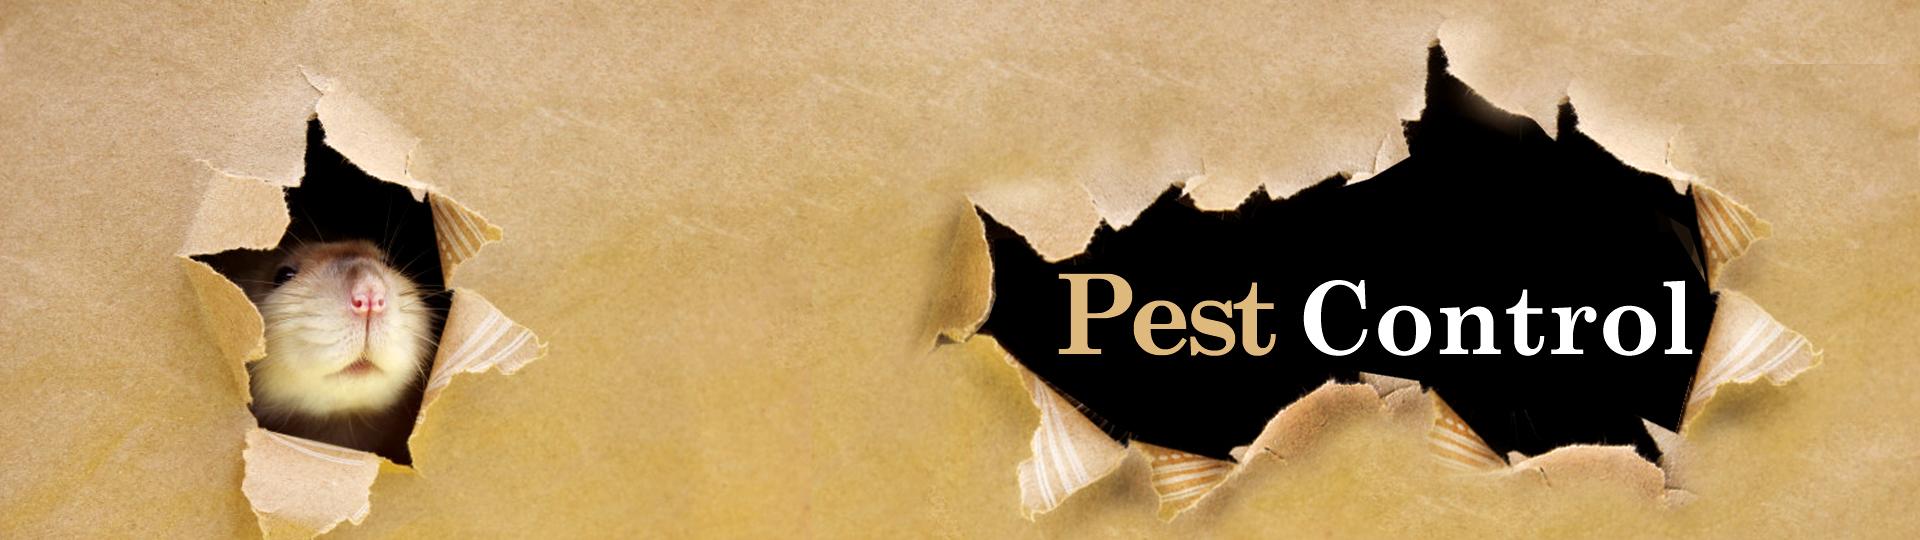 Pest Control product range